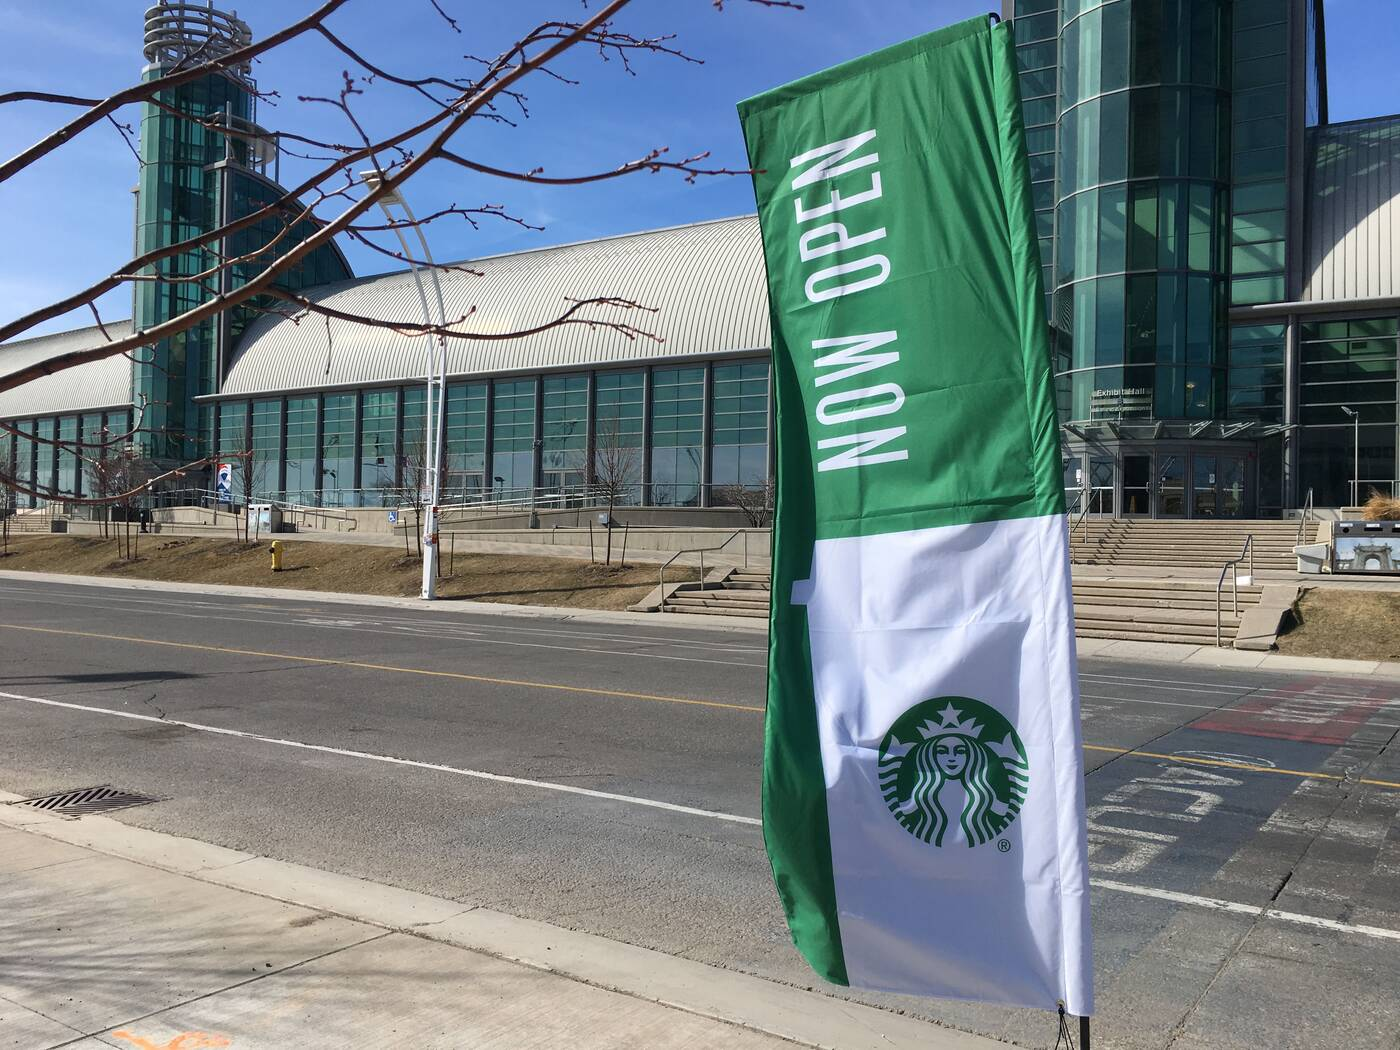 Starbucks Exhibition Place